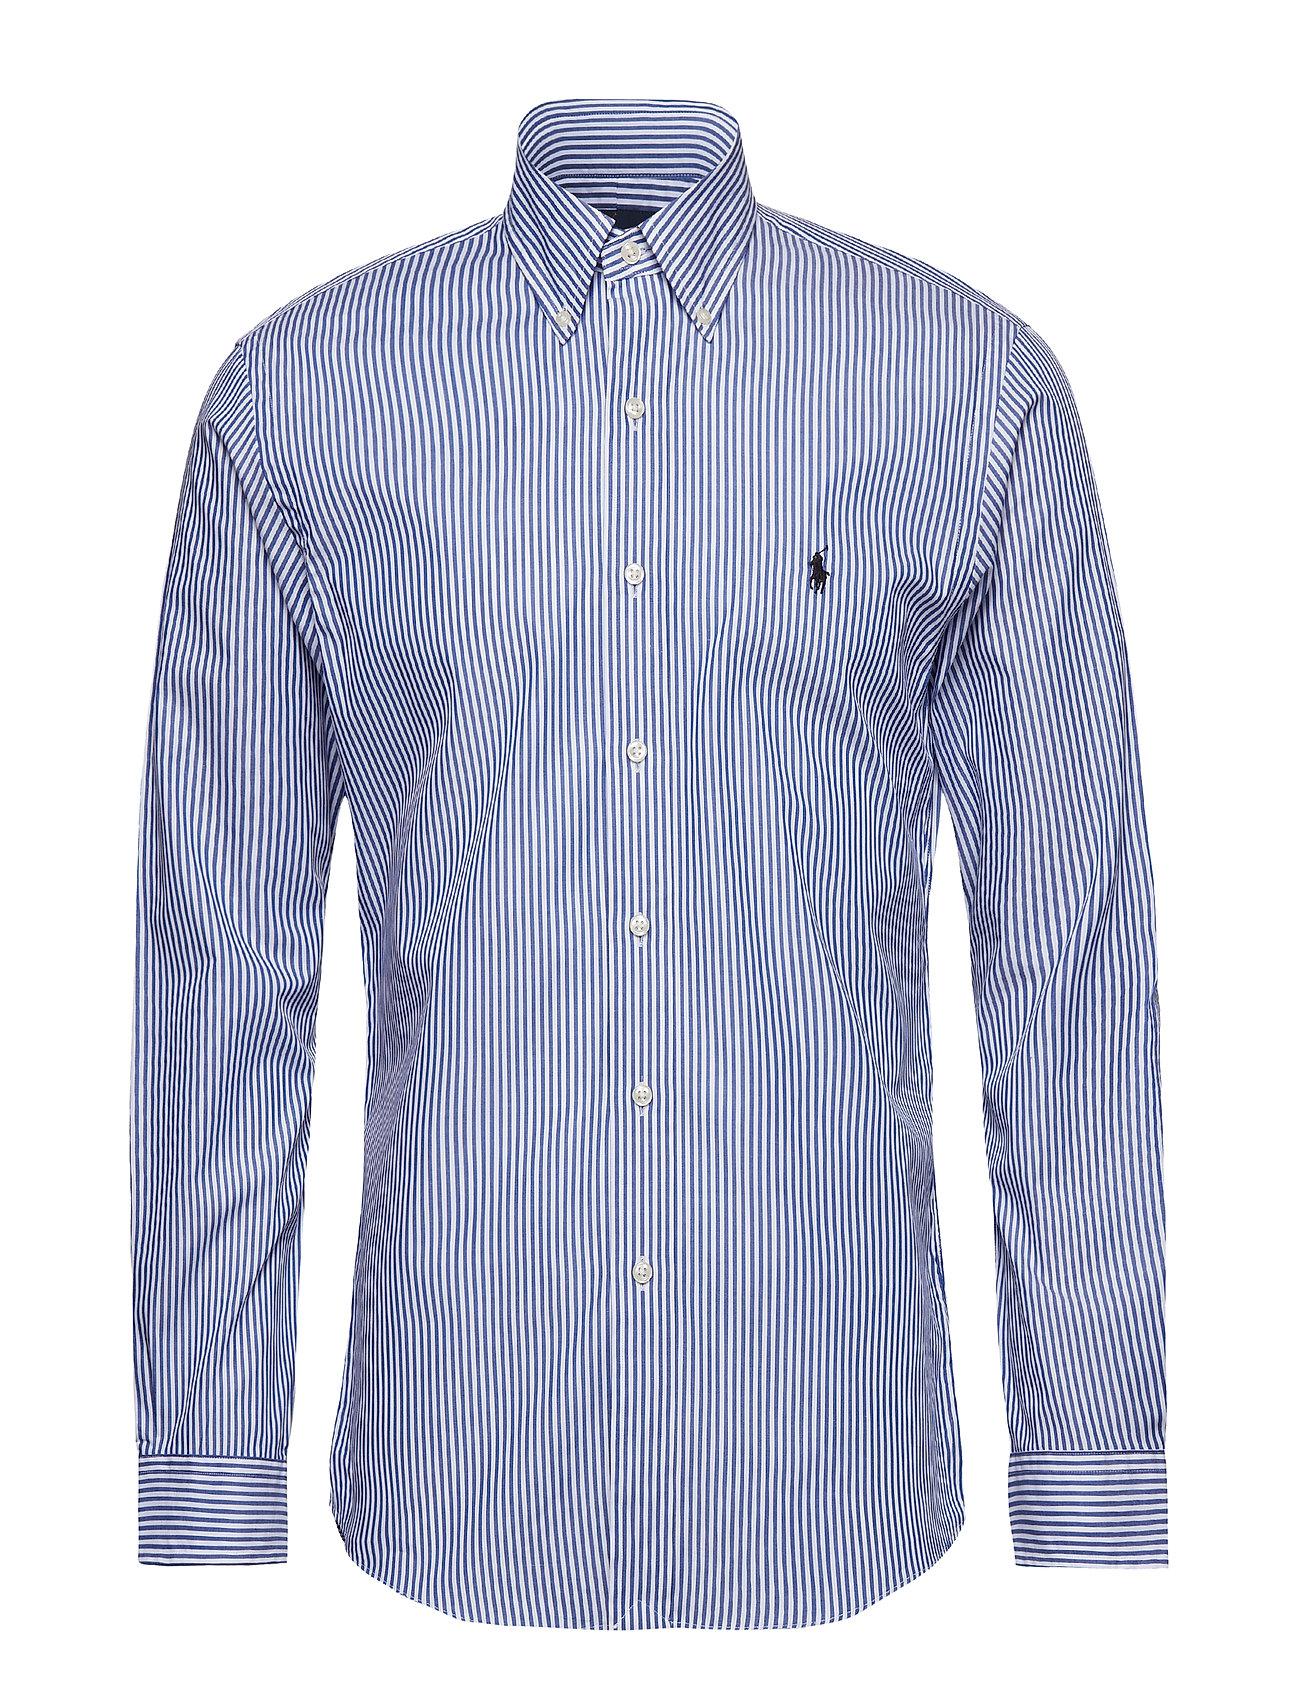 Polo Ralph Lauren Slim Fit Stretch Cotton Shirt - BLUE/WHITE BENGAL